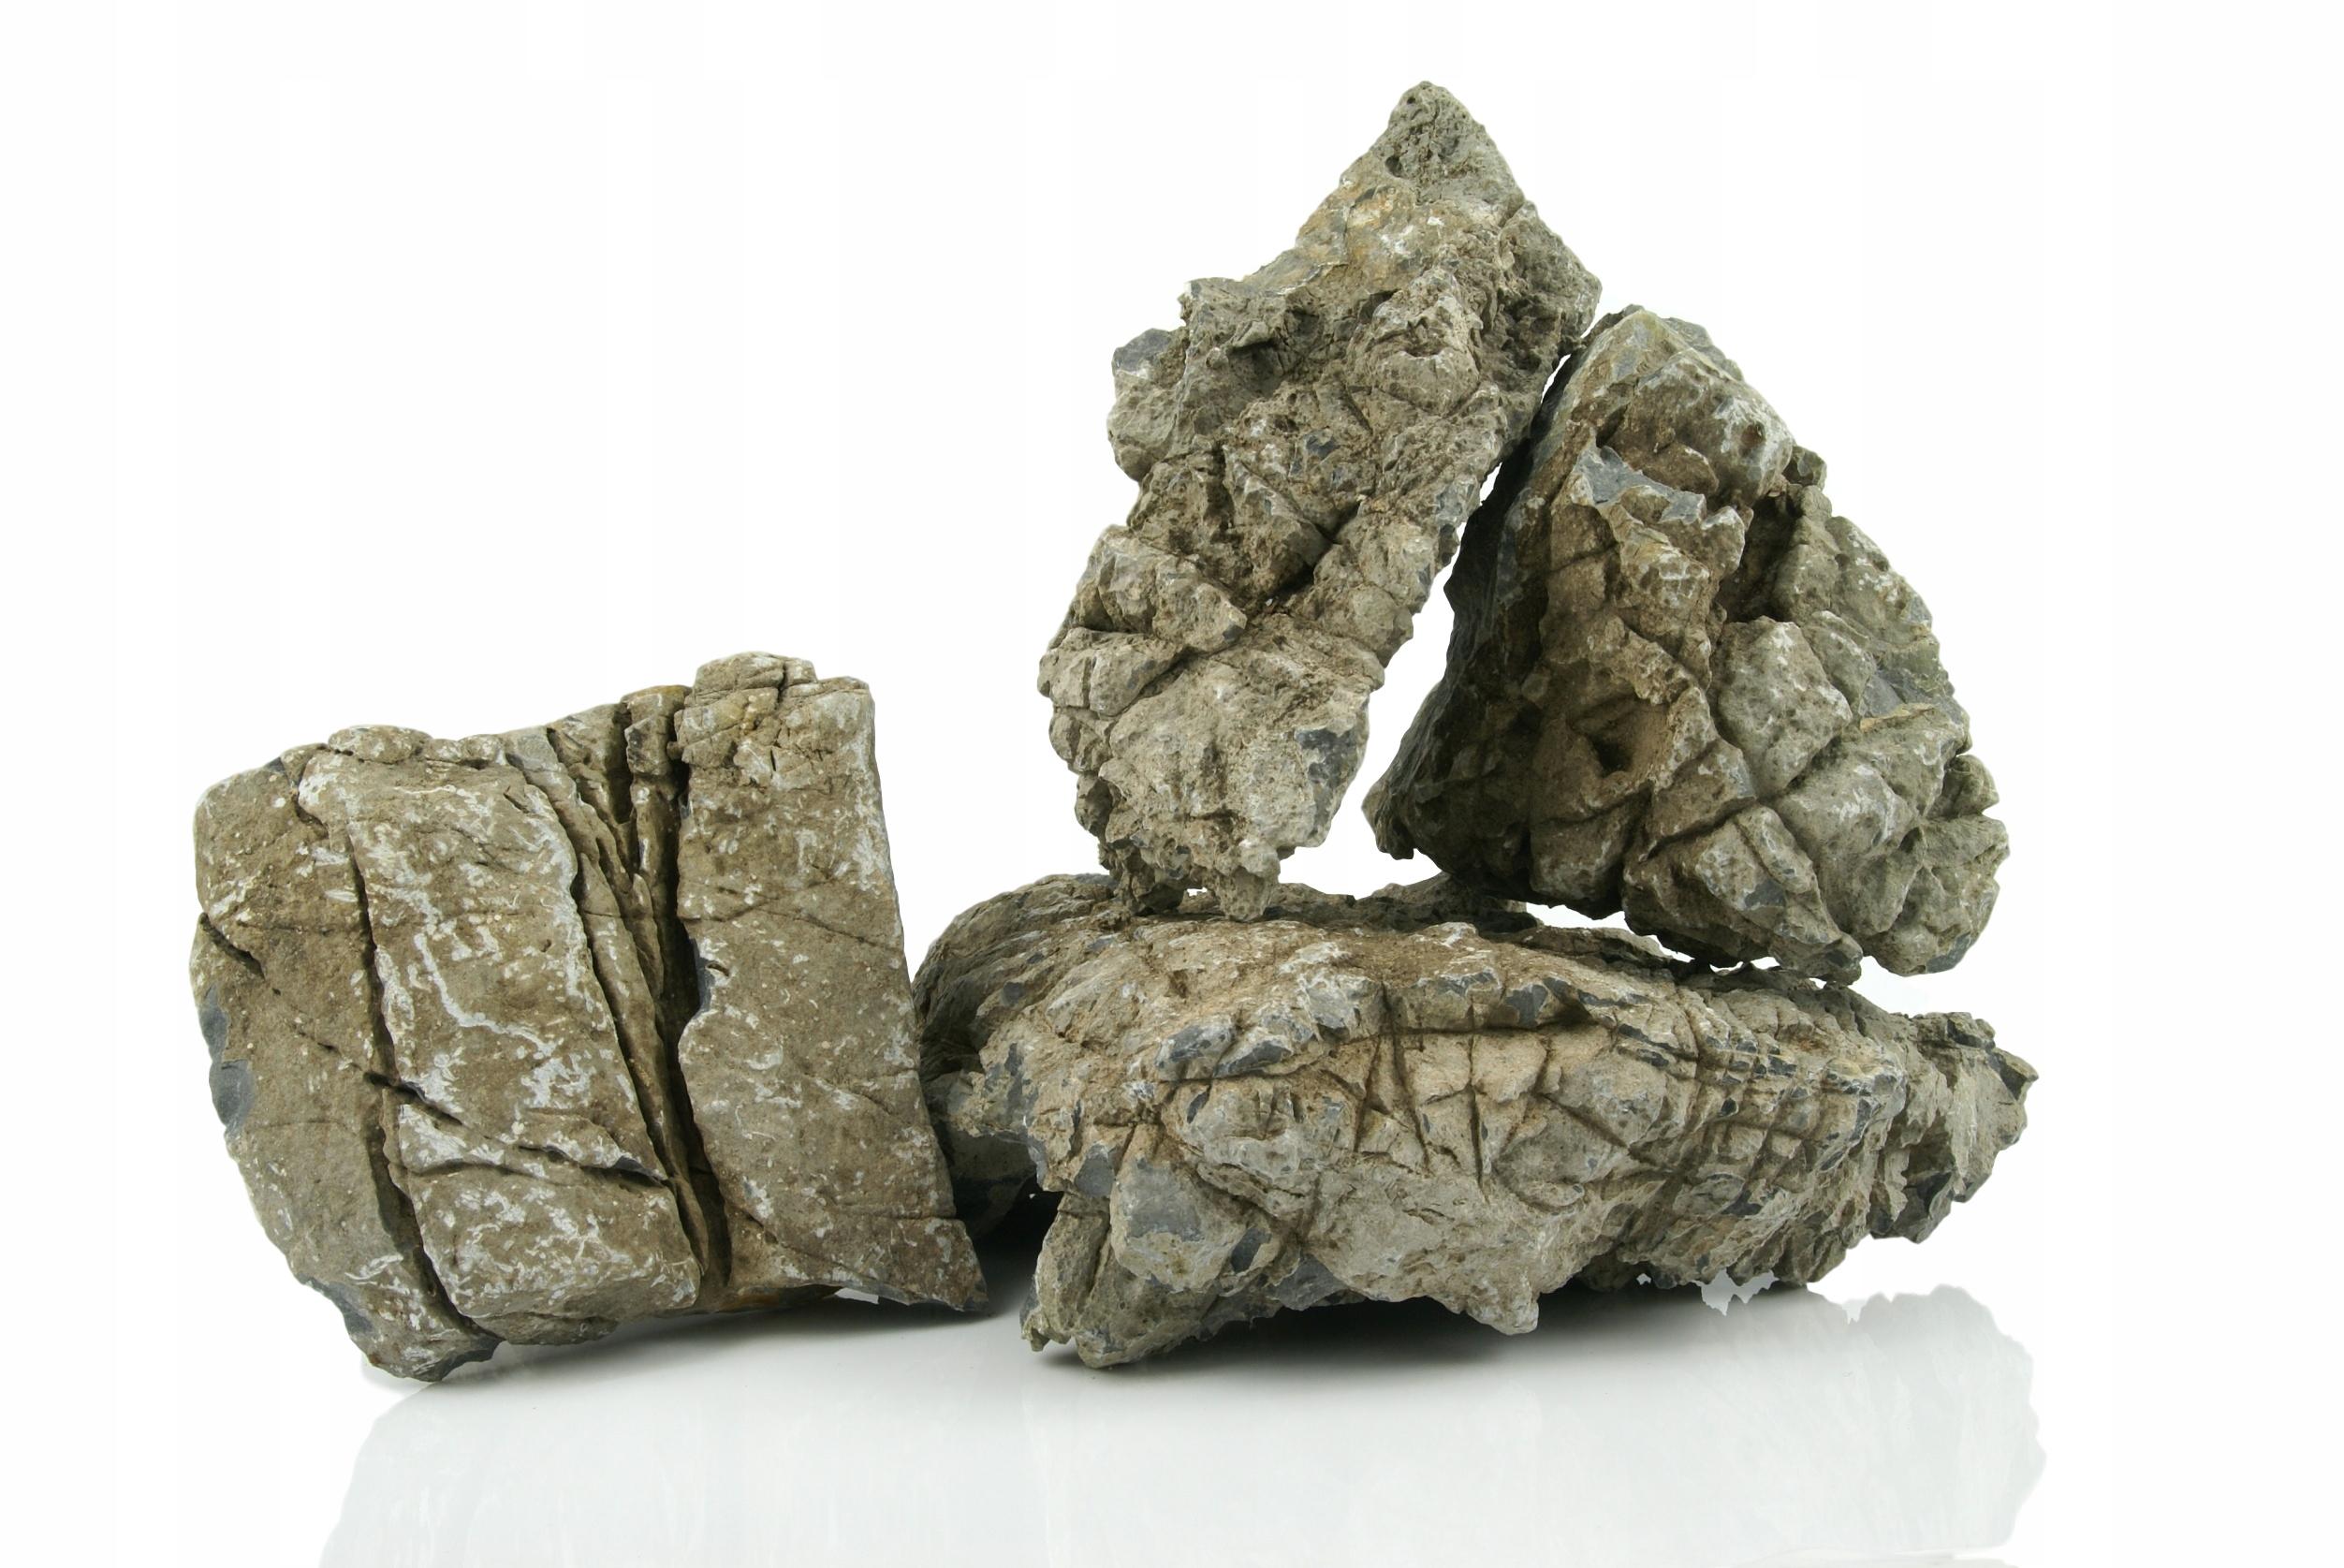 Kameň SLON koža Slon Akvárium 20kg